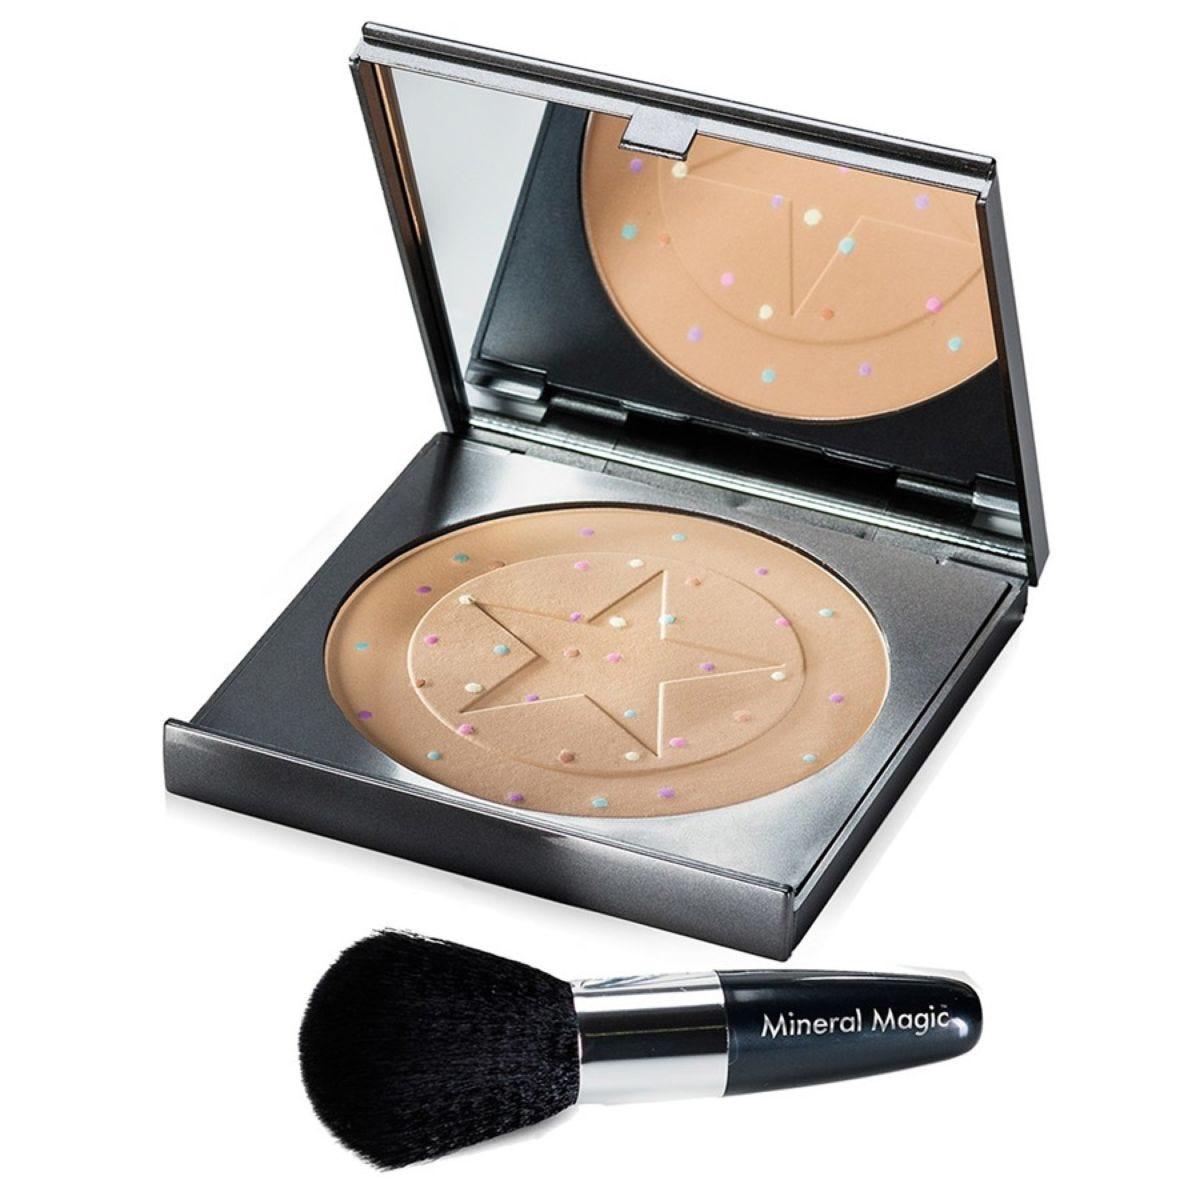 JML Mineral Magic: Skin Perfecting Make-up Powder & Brush Set